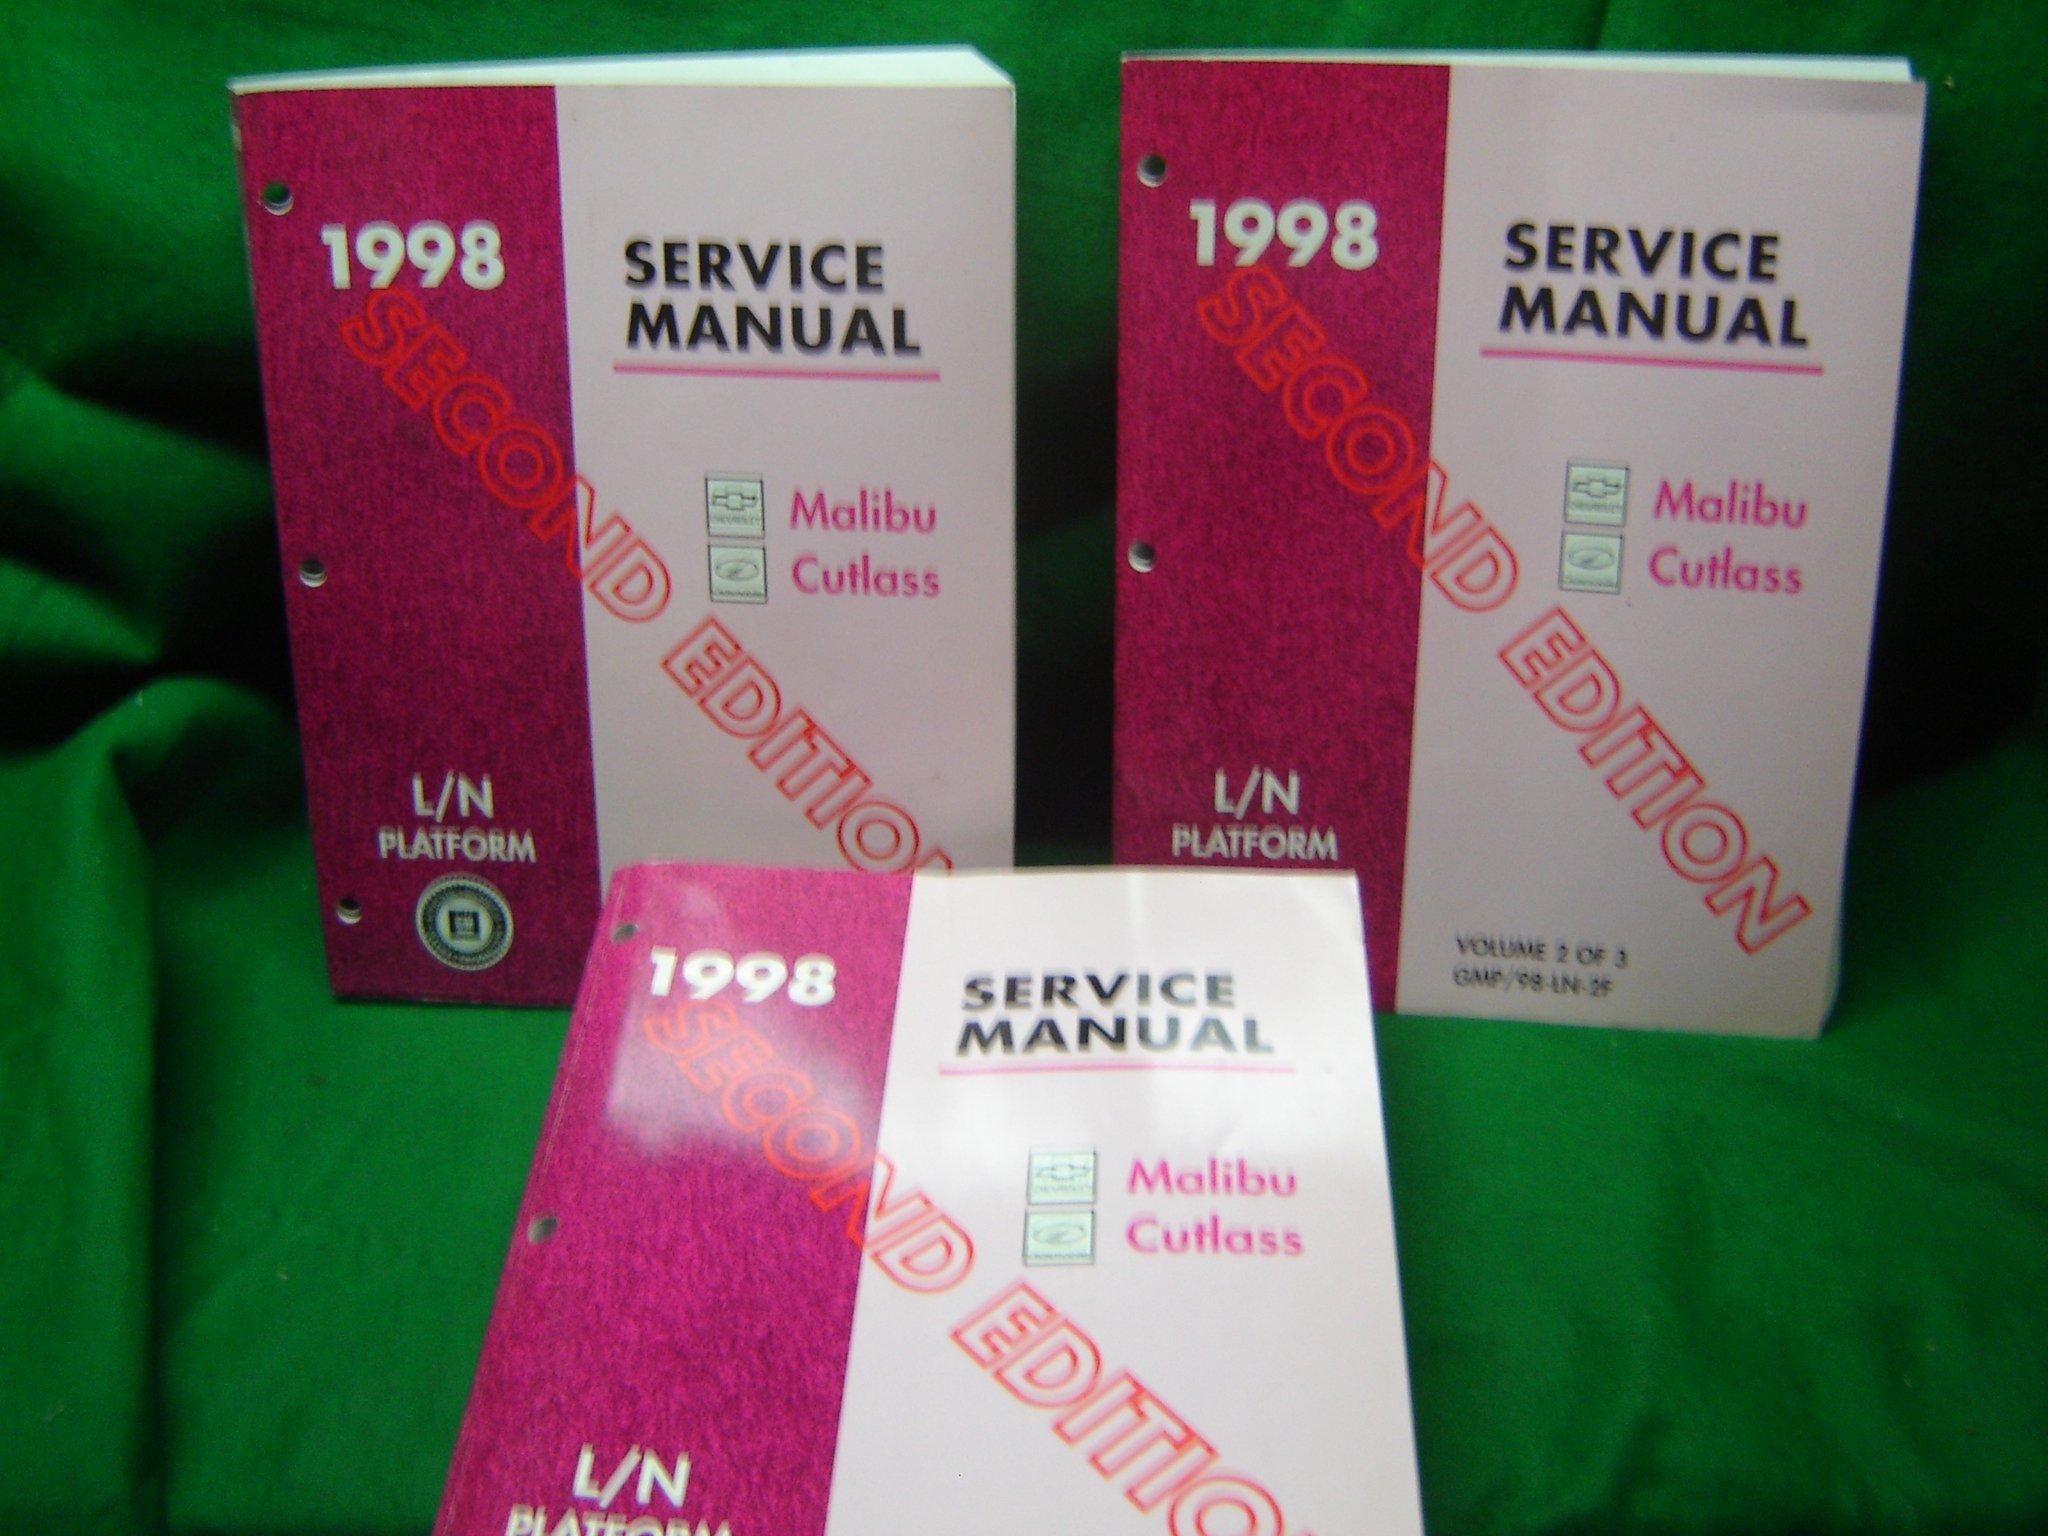 1998 Service Manual Chevrolet Malibu and the Oldsmobile Cutlass (Volumes 1-3):  General Motors: Amazon.com: Books